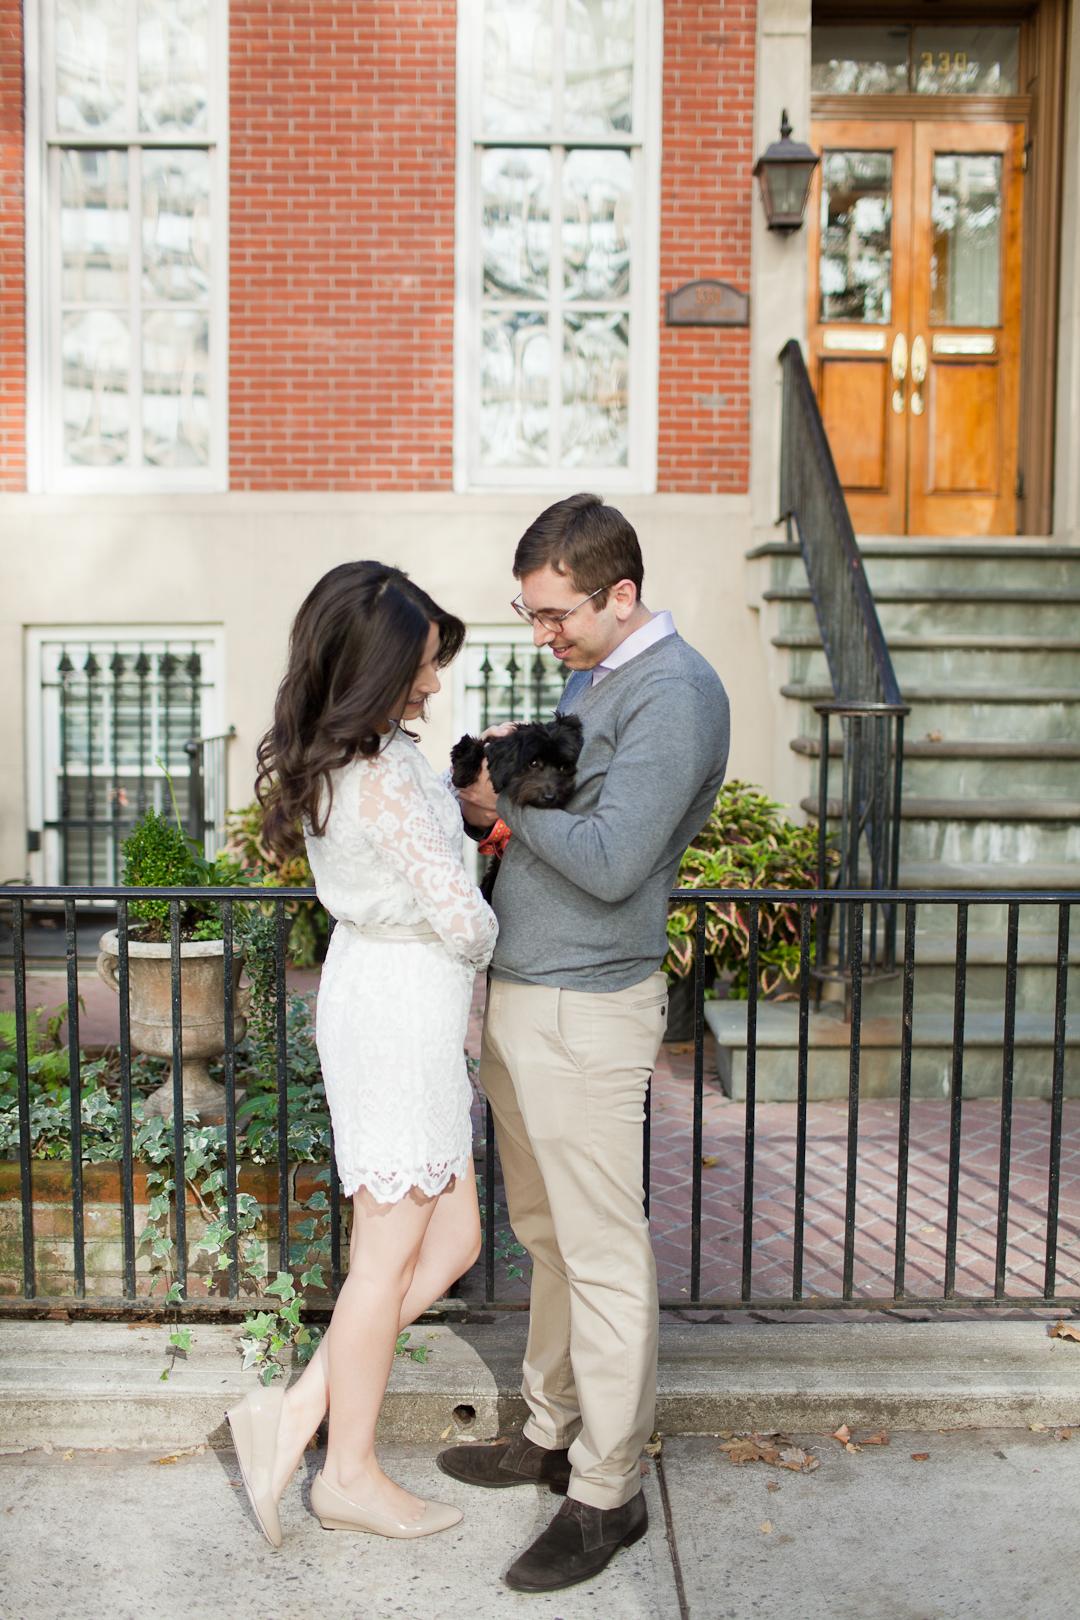 Melissa Kruse Photography - Christina & Alex Kips Bay Engagement Photos-6.jpg